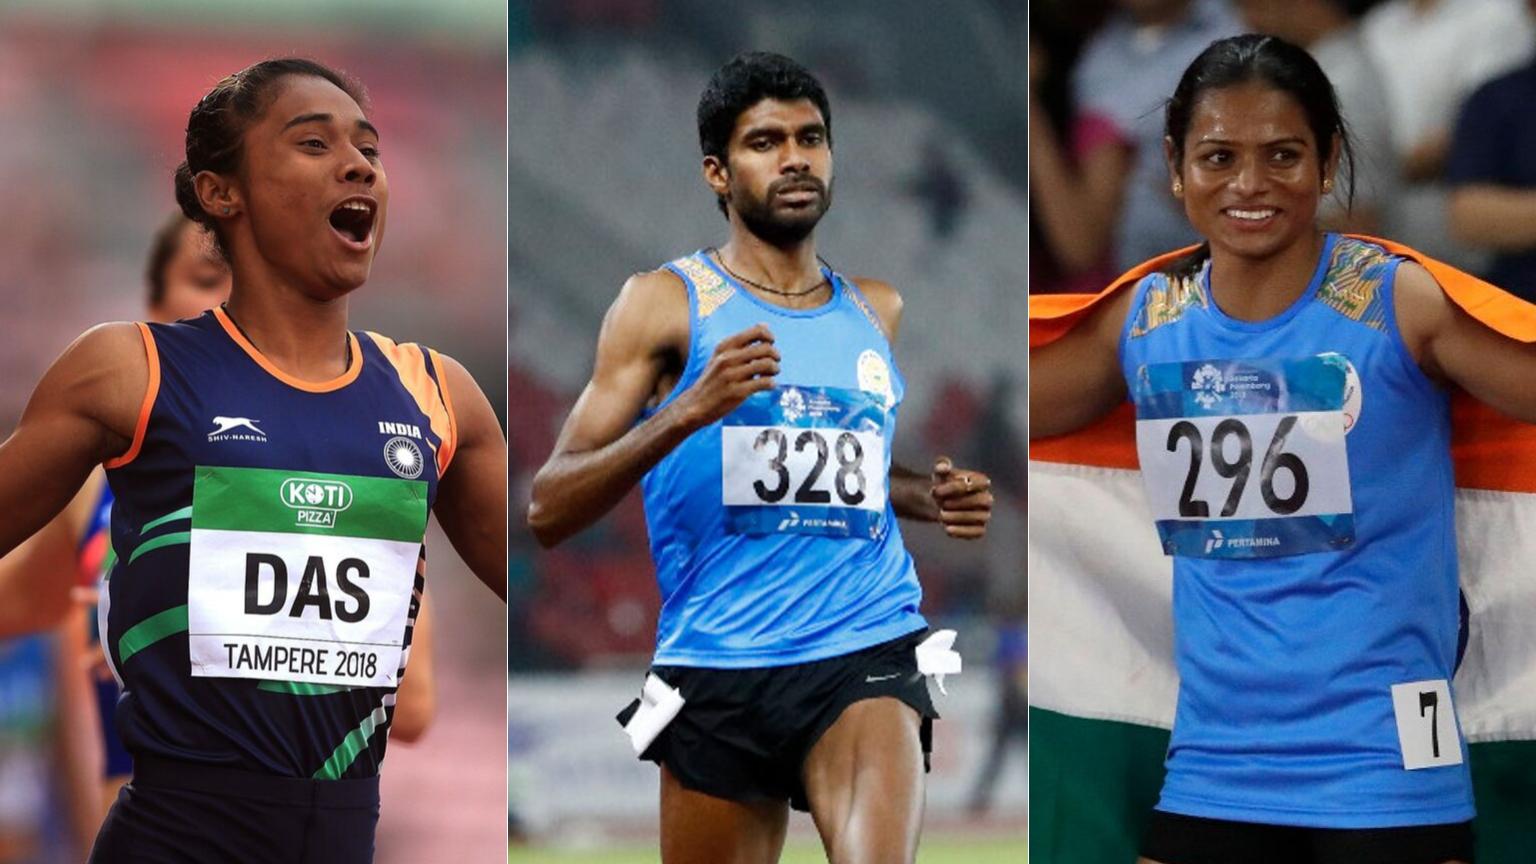 World Athletics C'ships: 27 Indians in 16 Events & No Hima, Neeraj